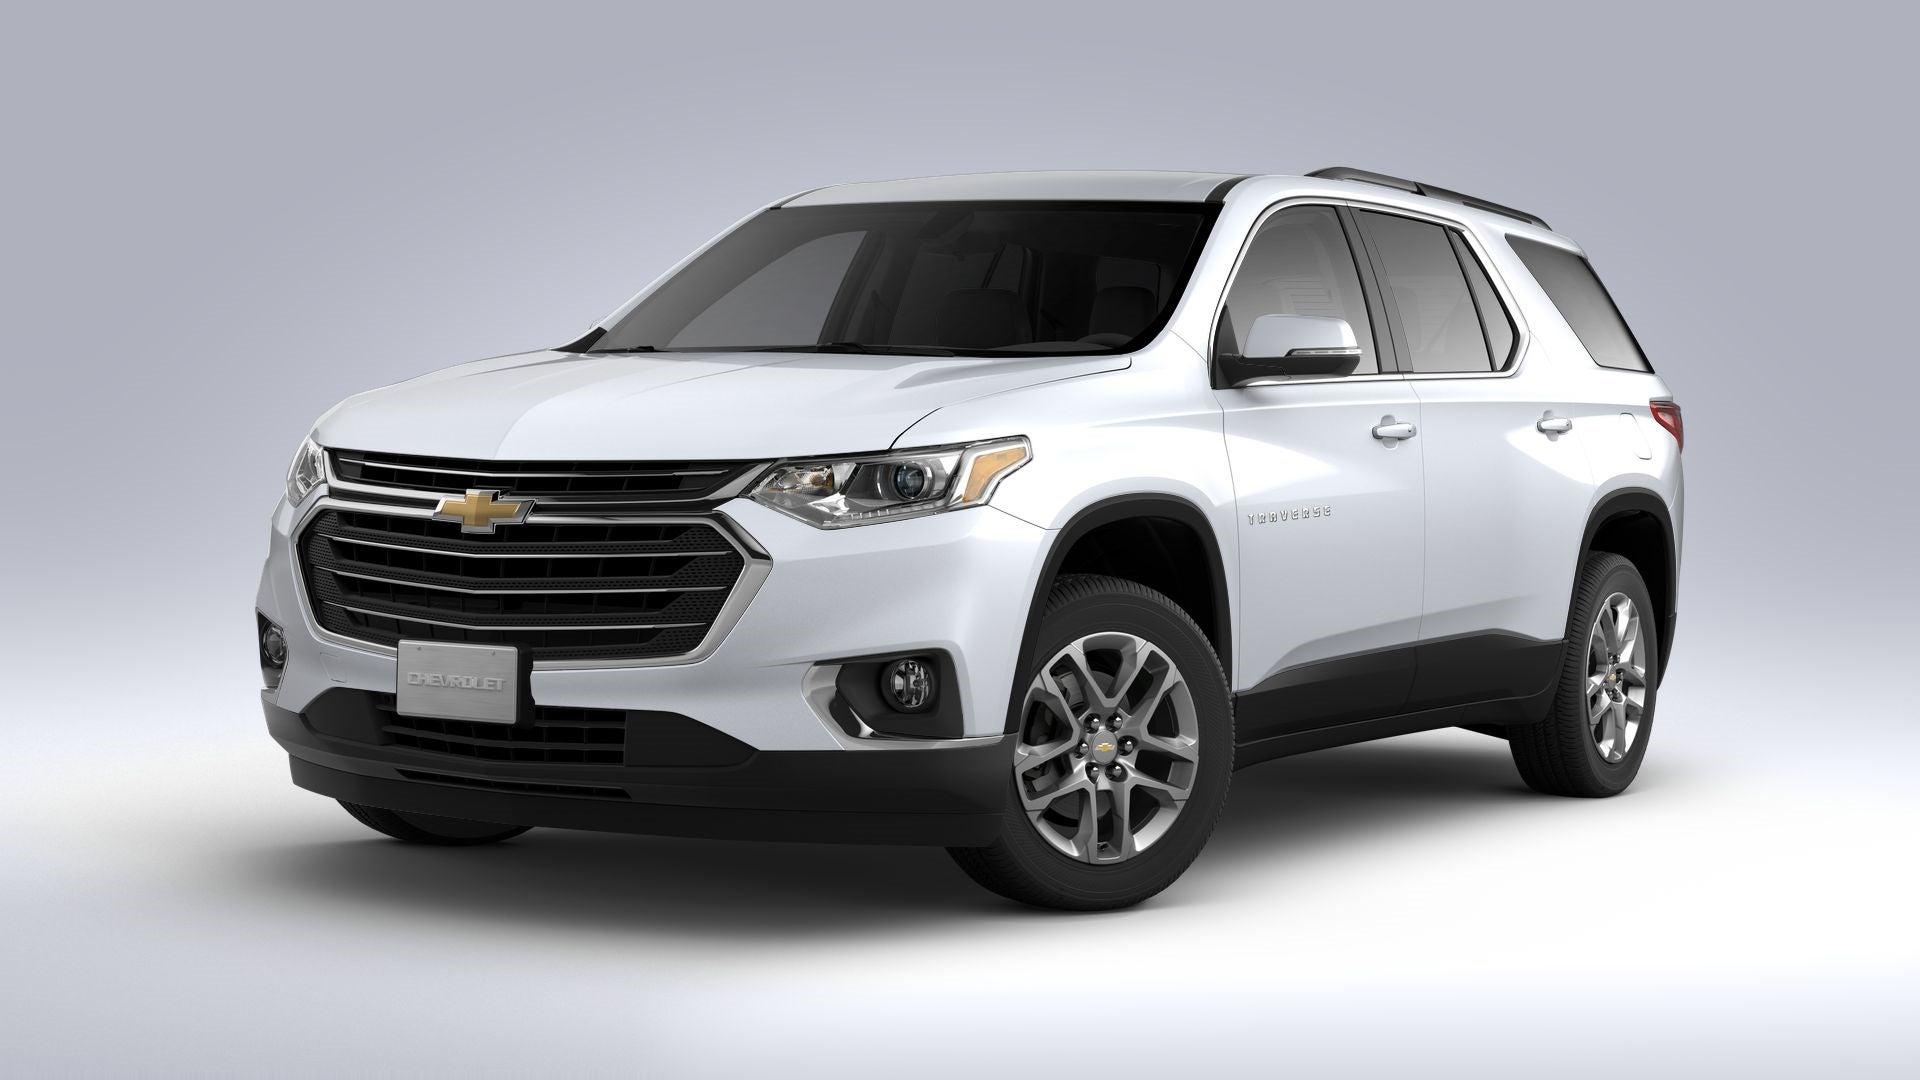 2021 Chevrolet Traverse Bloomer WI